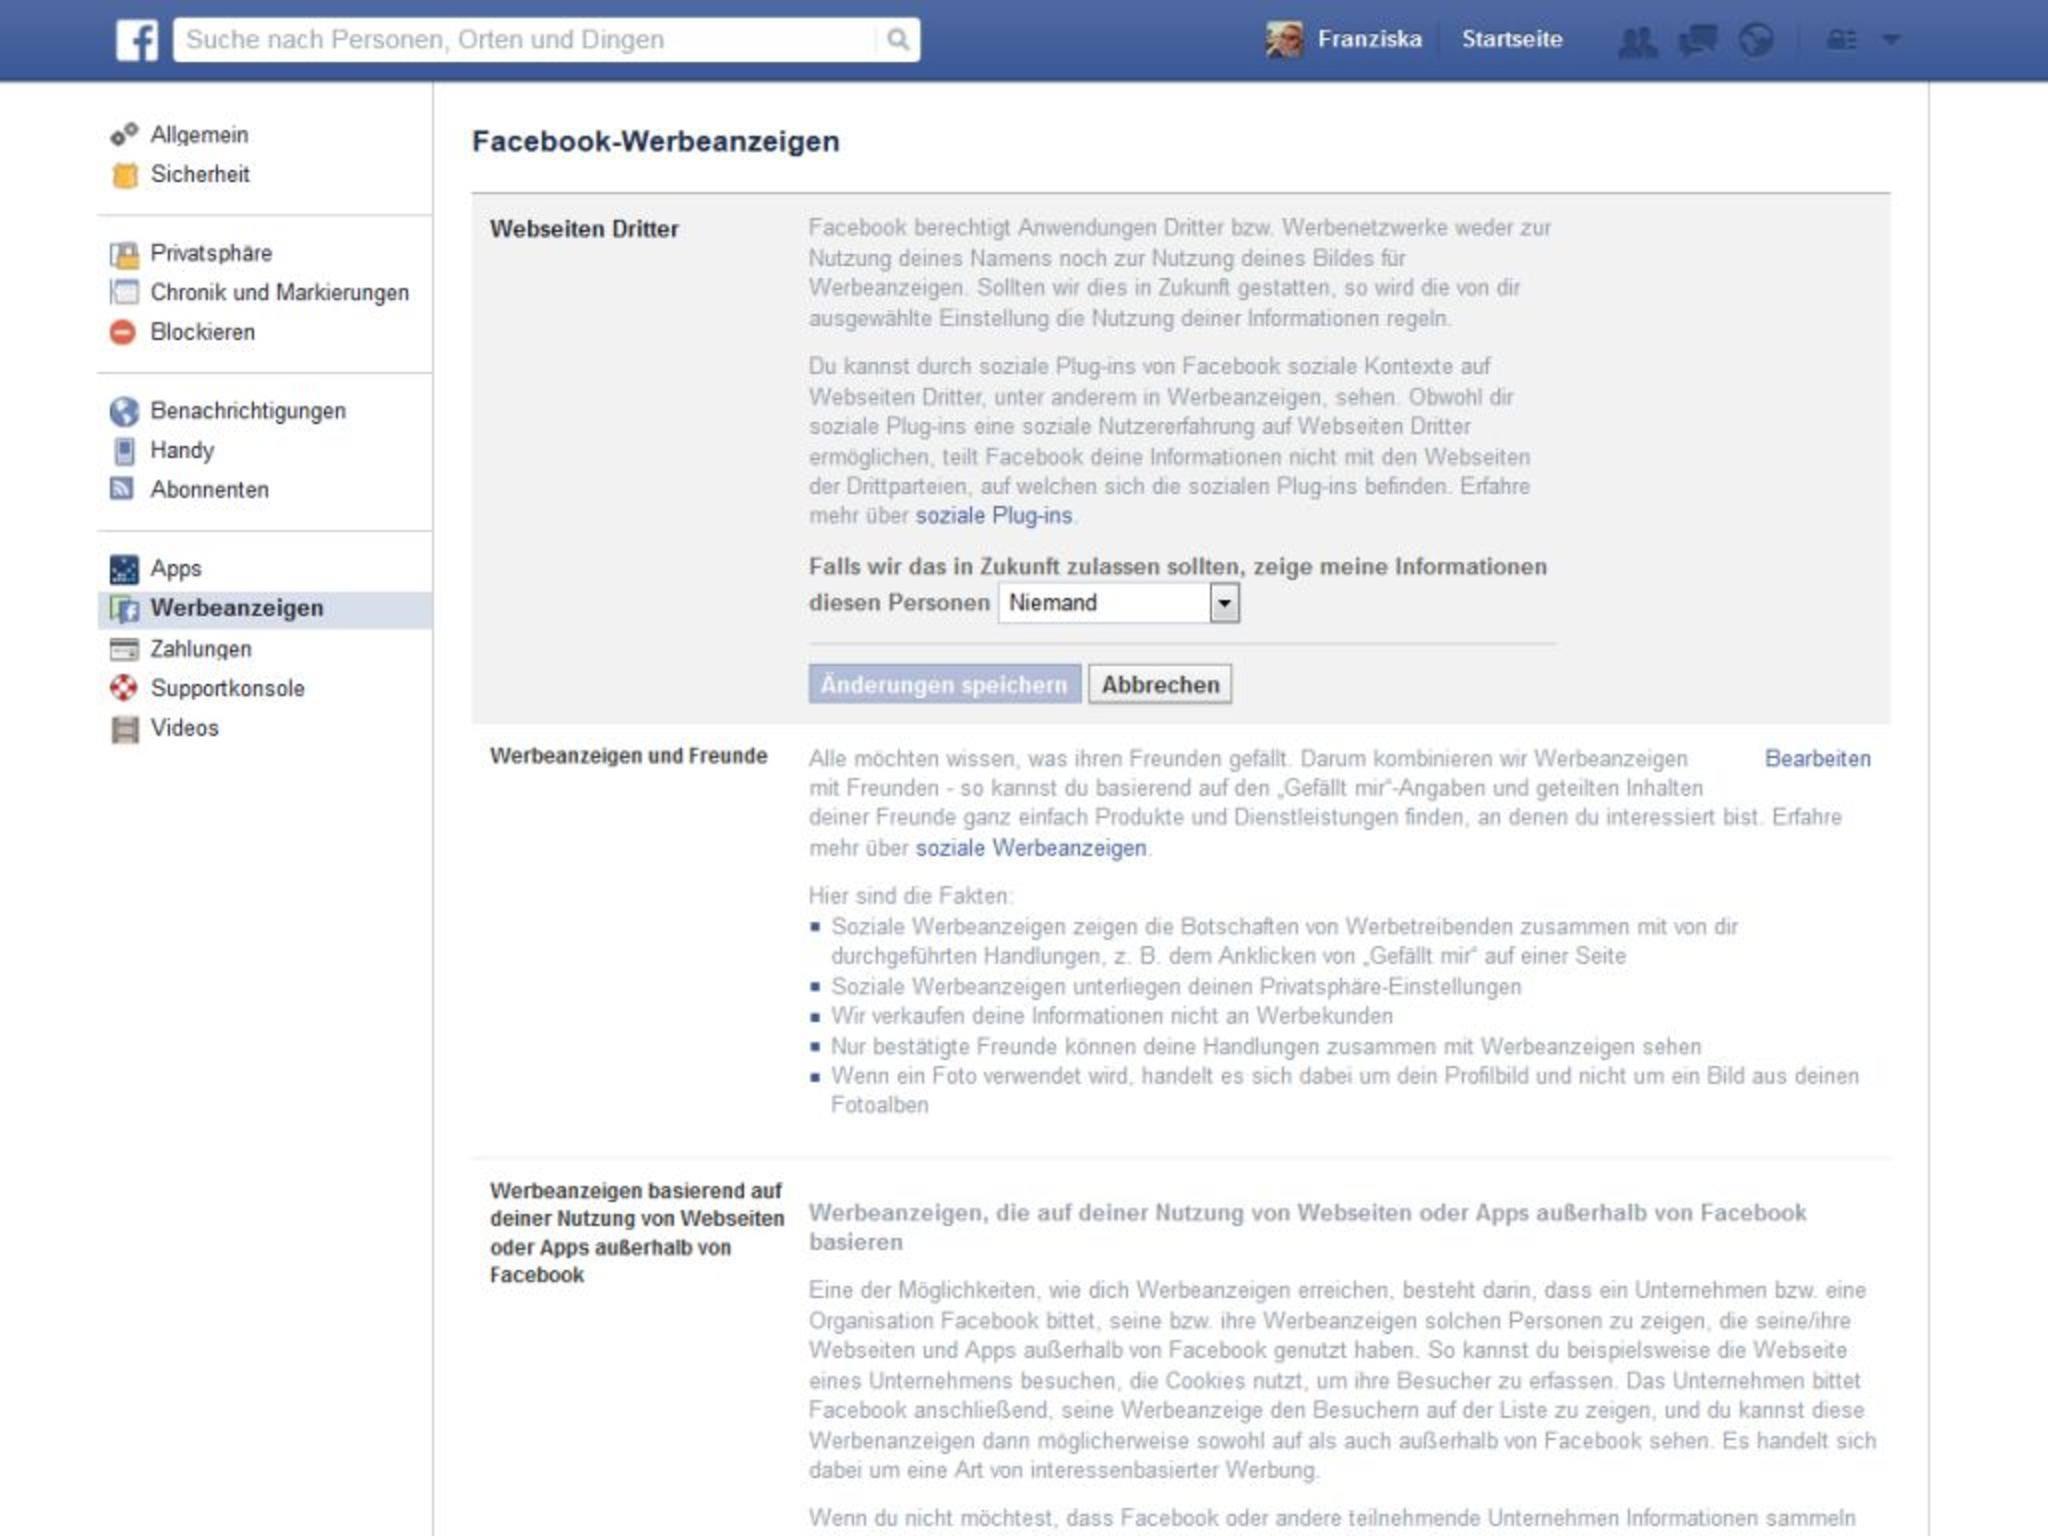 Facebook-Werbeanzeigen